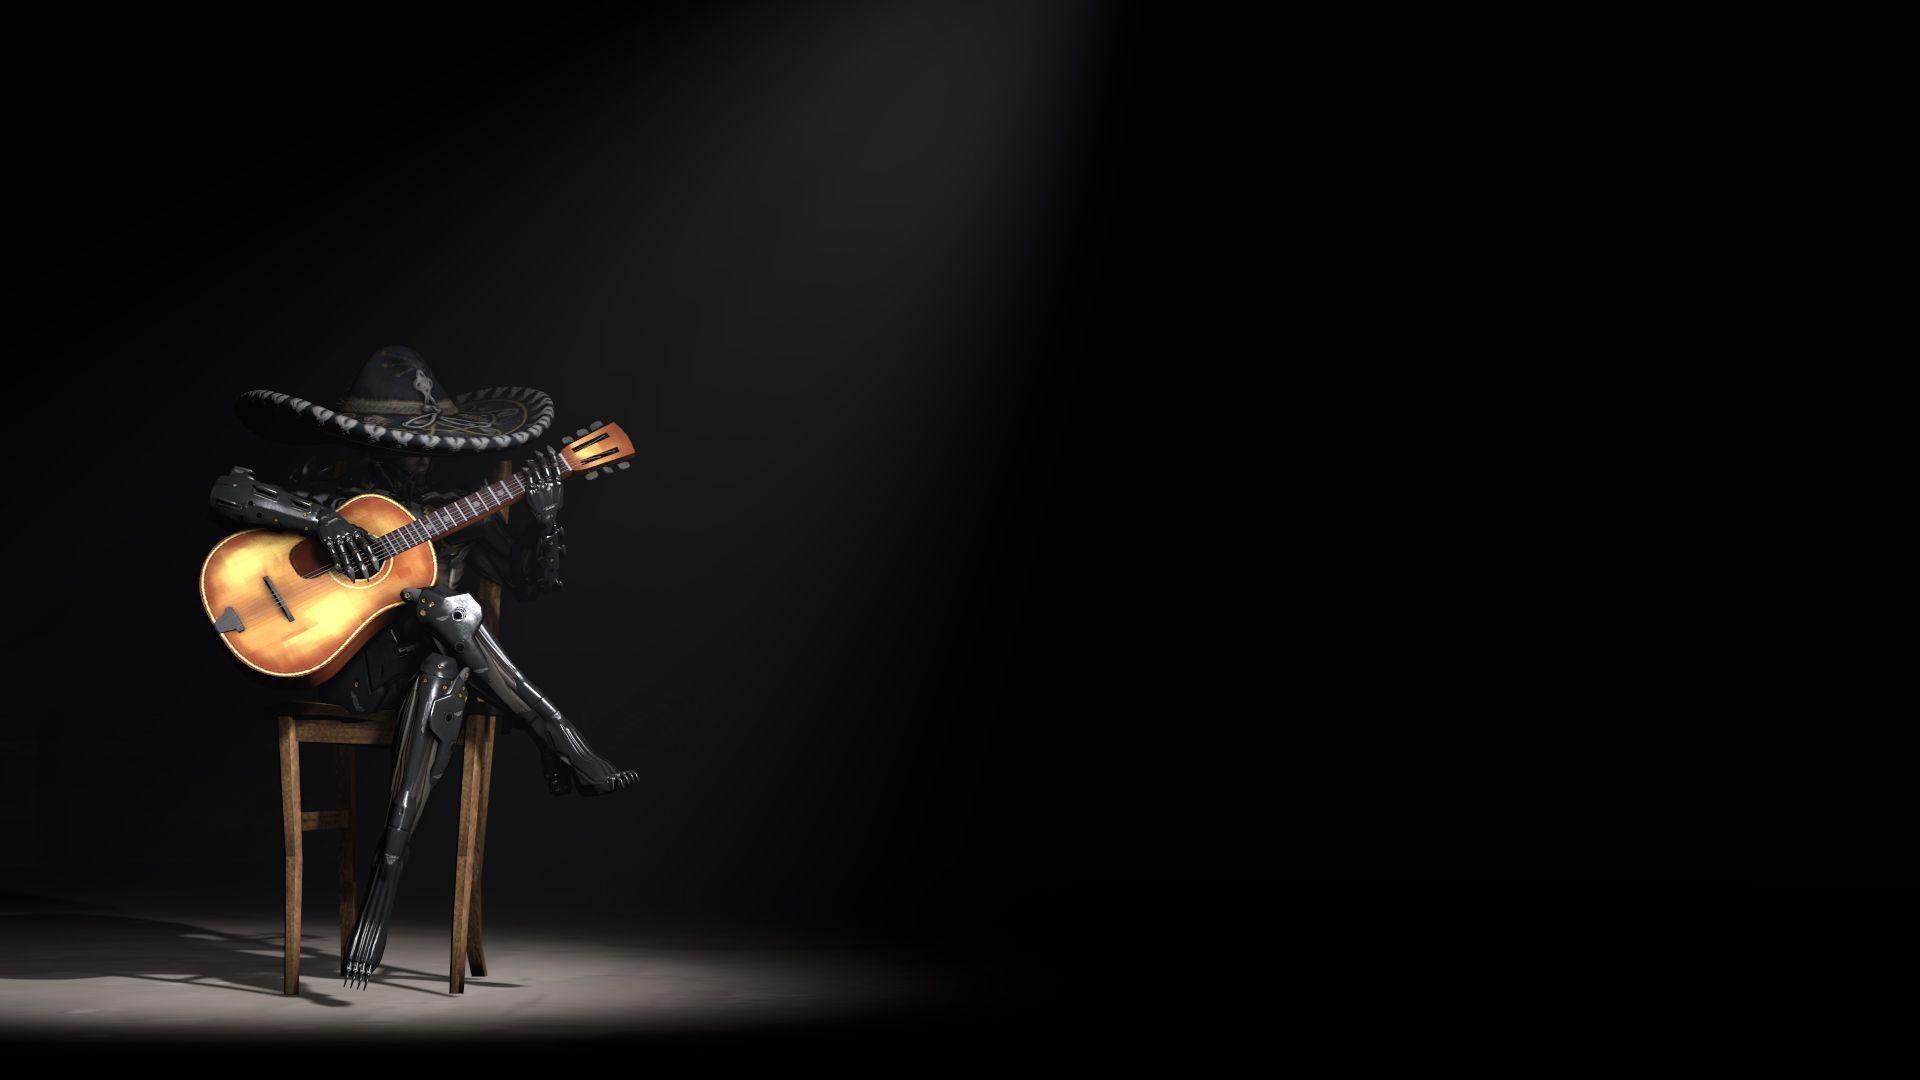 Raiden – Metal Gear Solid wallpaper